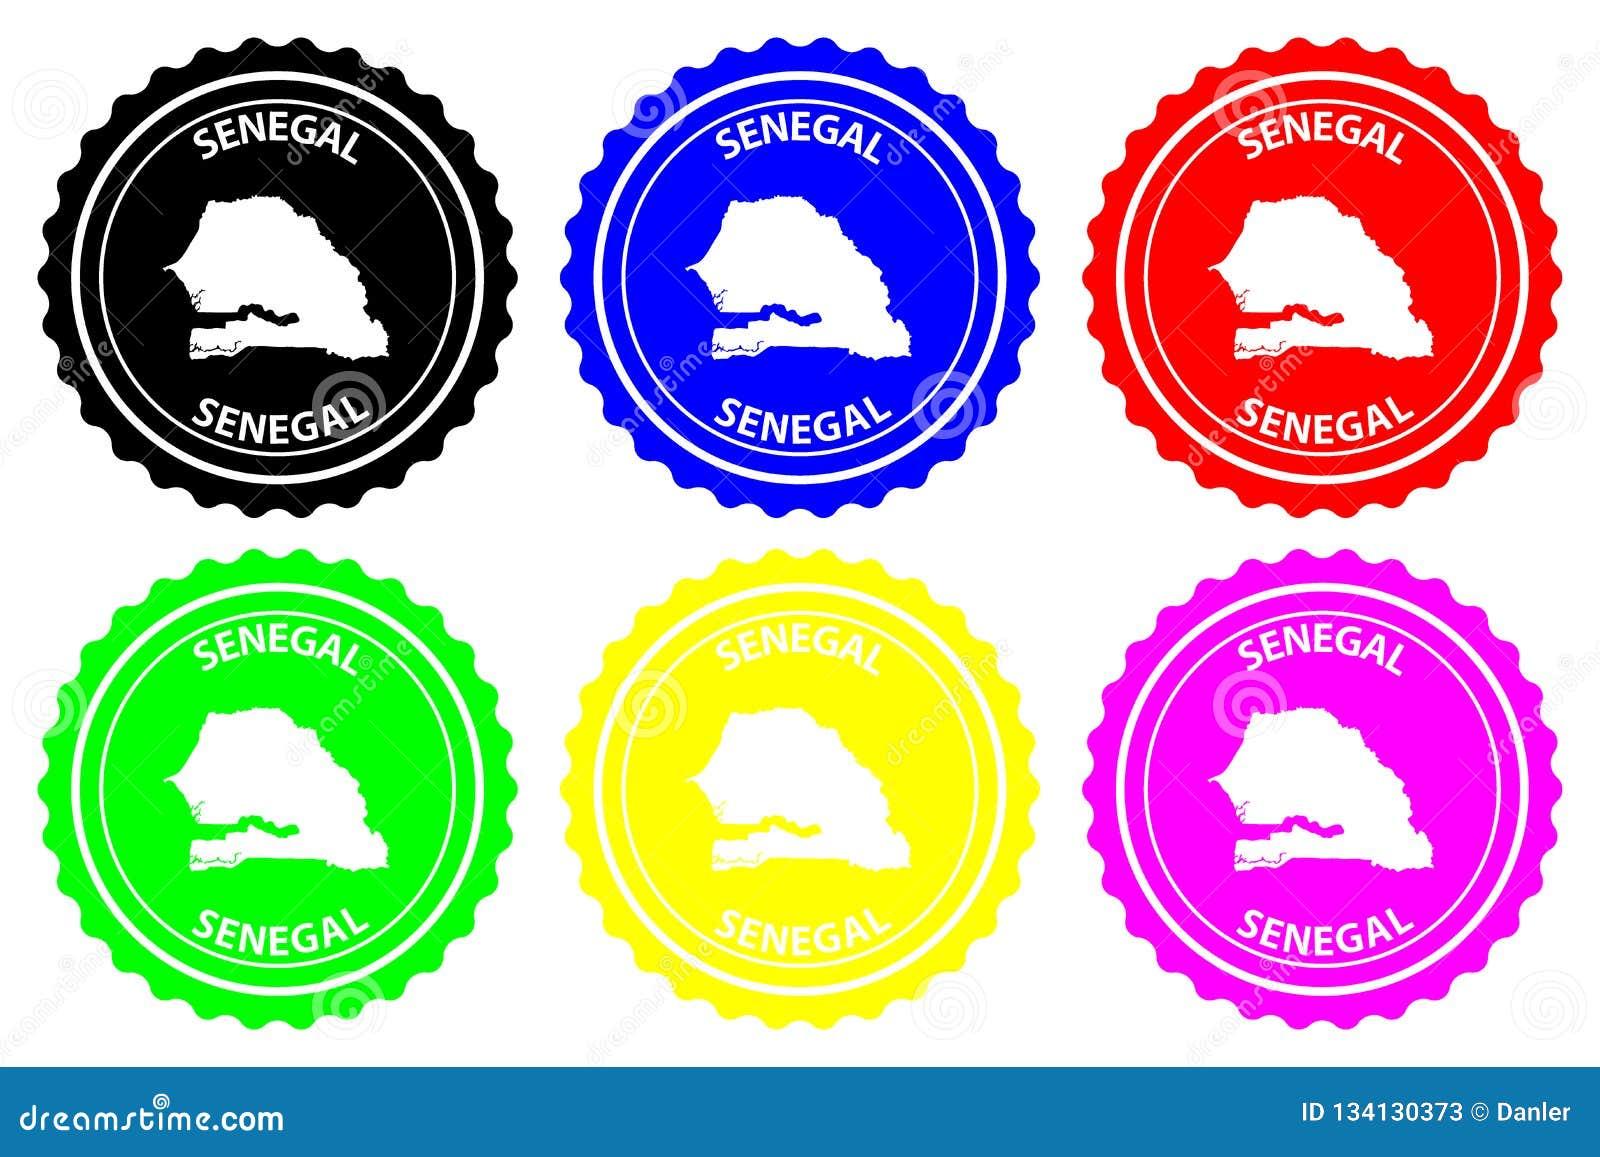 Senegal rubber stamp